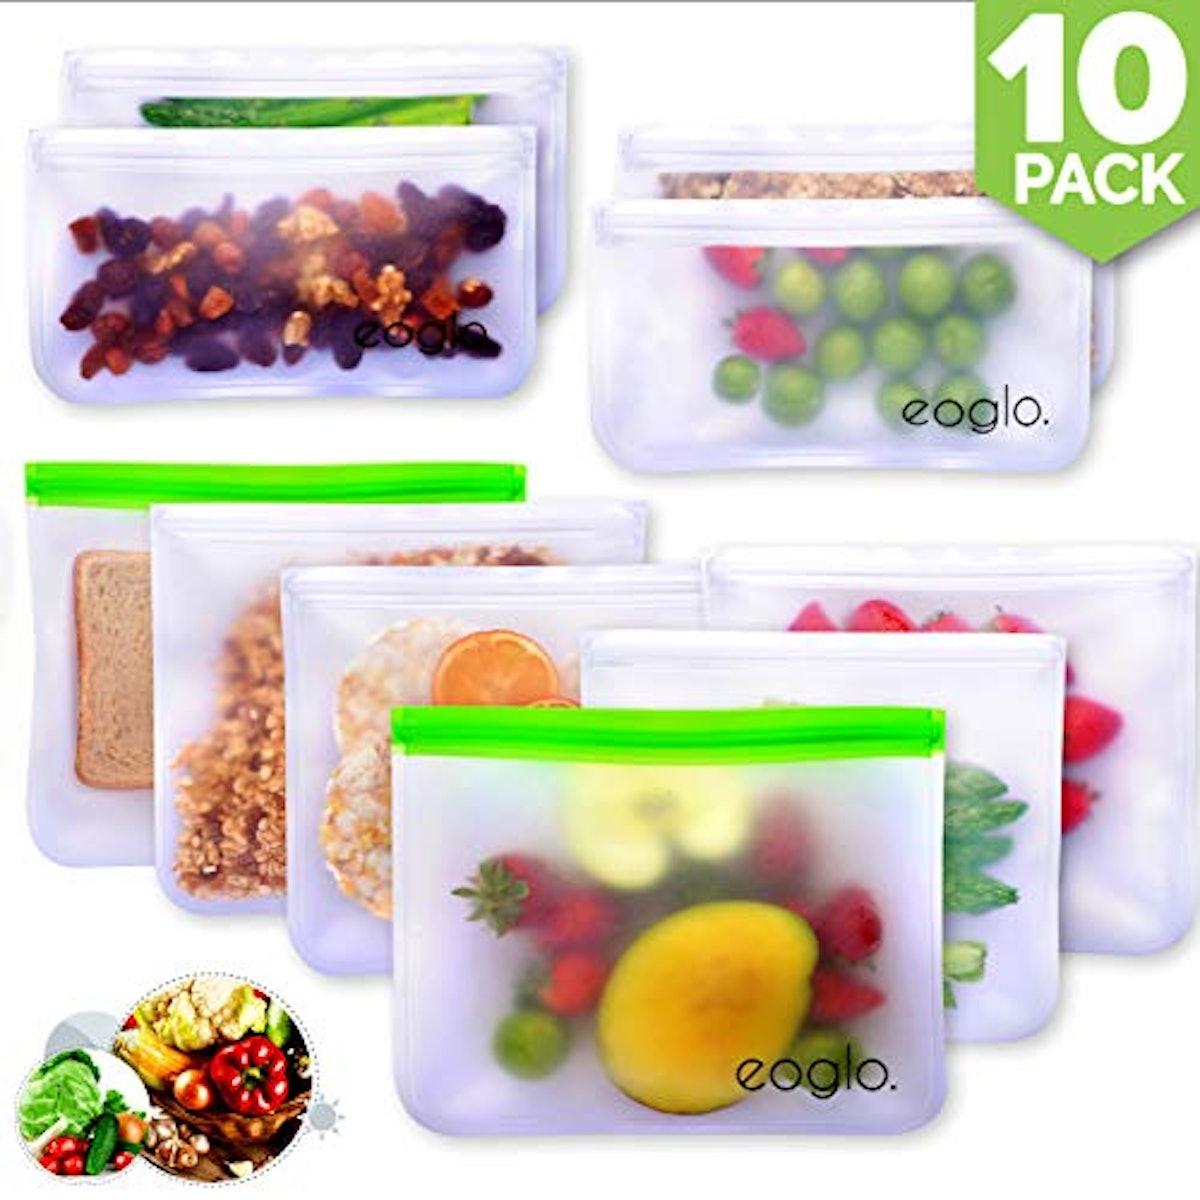 innokitchen Reusable Storage Bags (10-Pack)